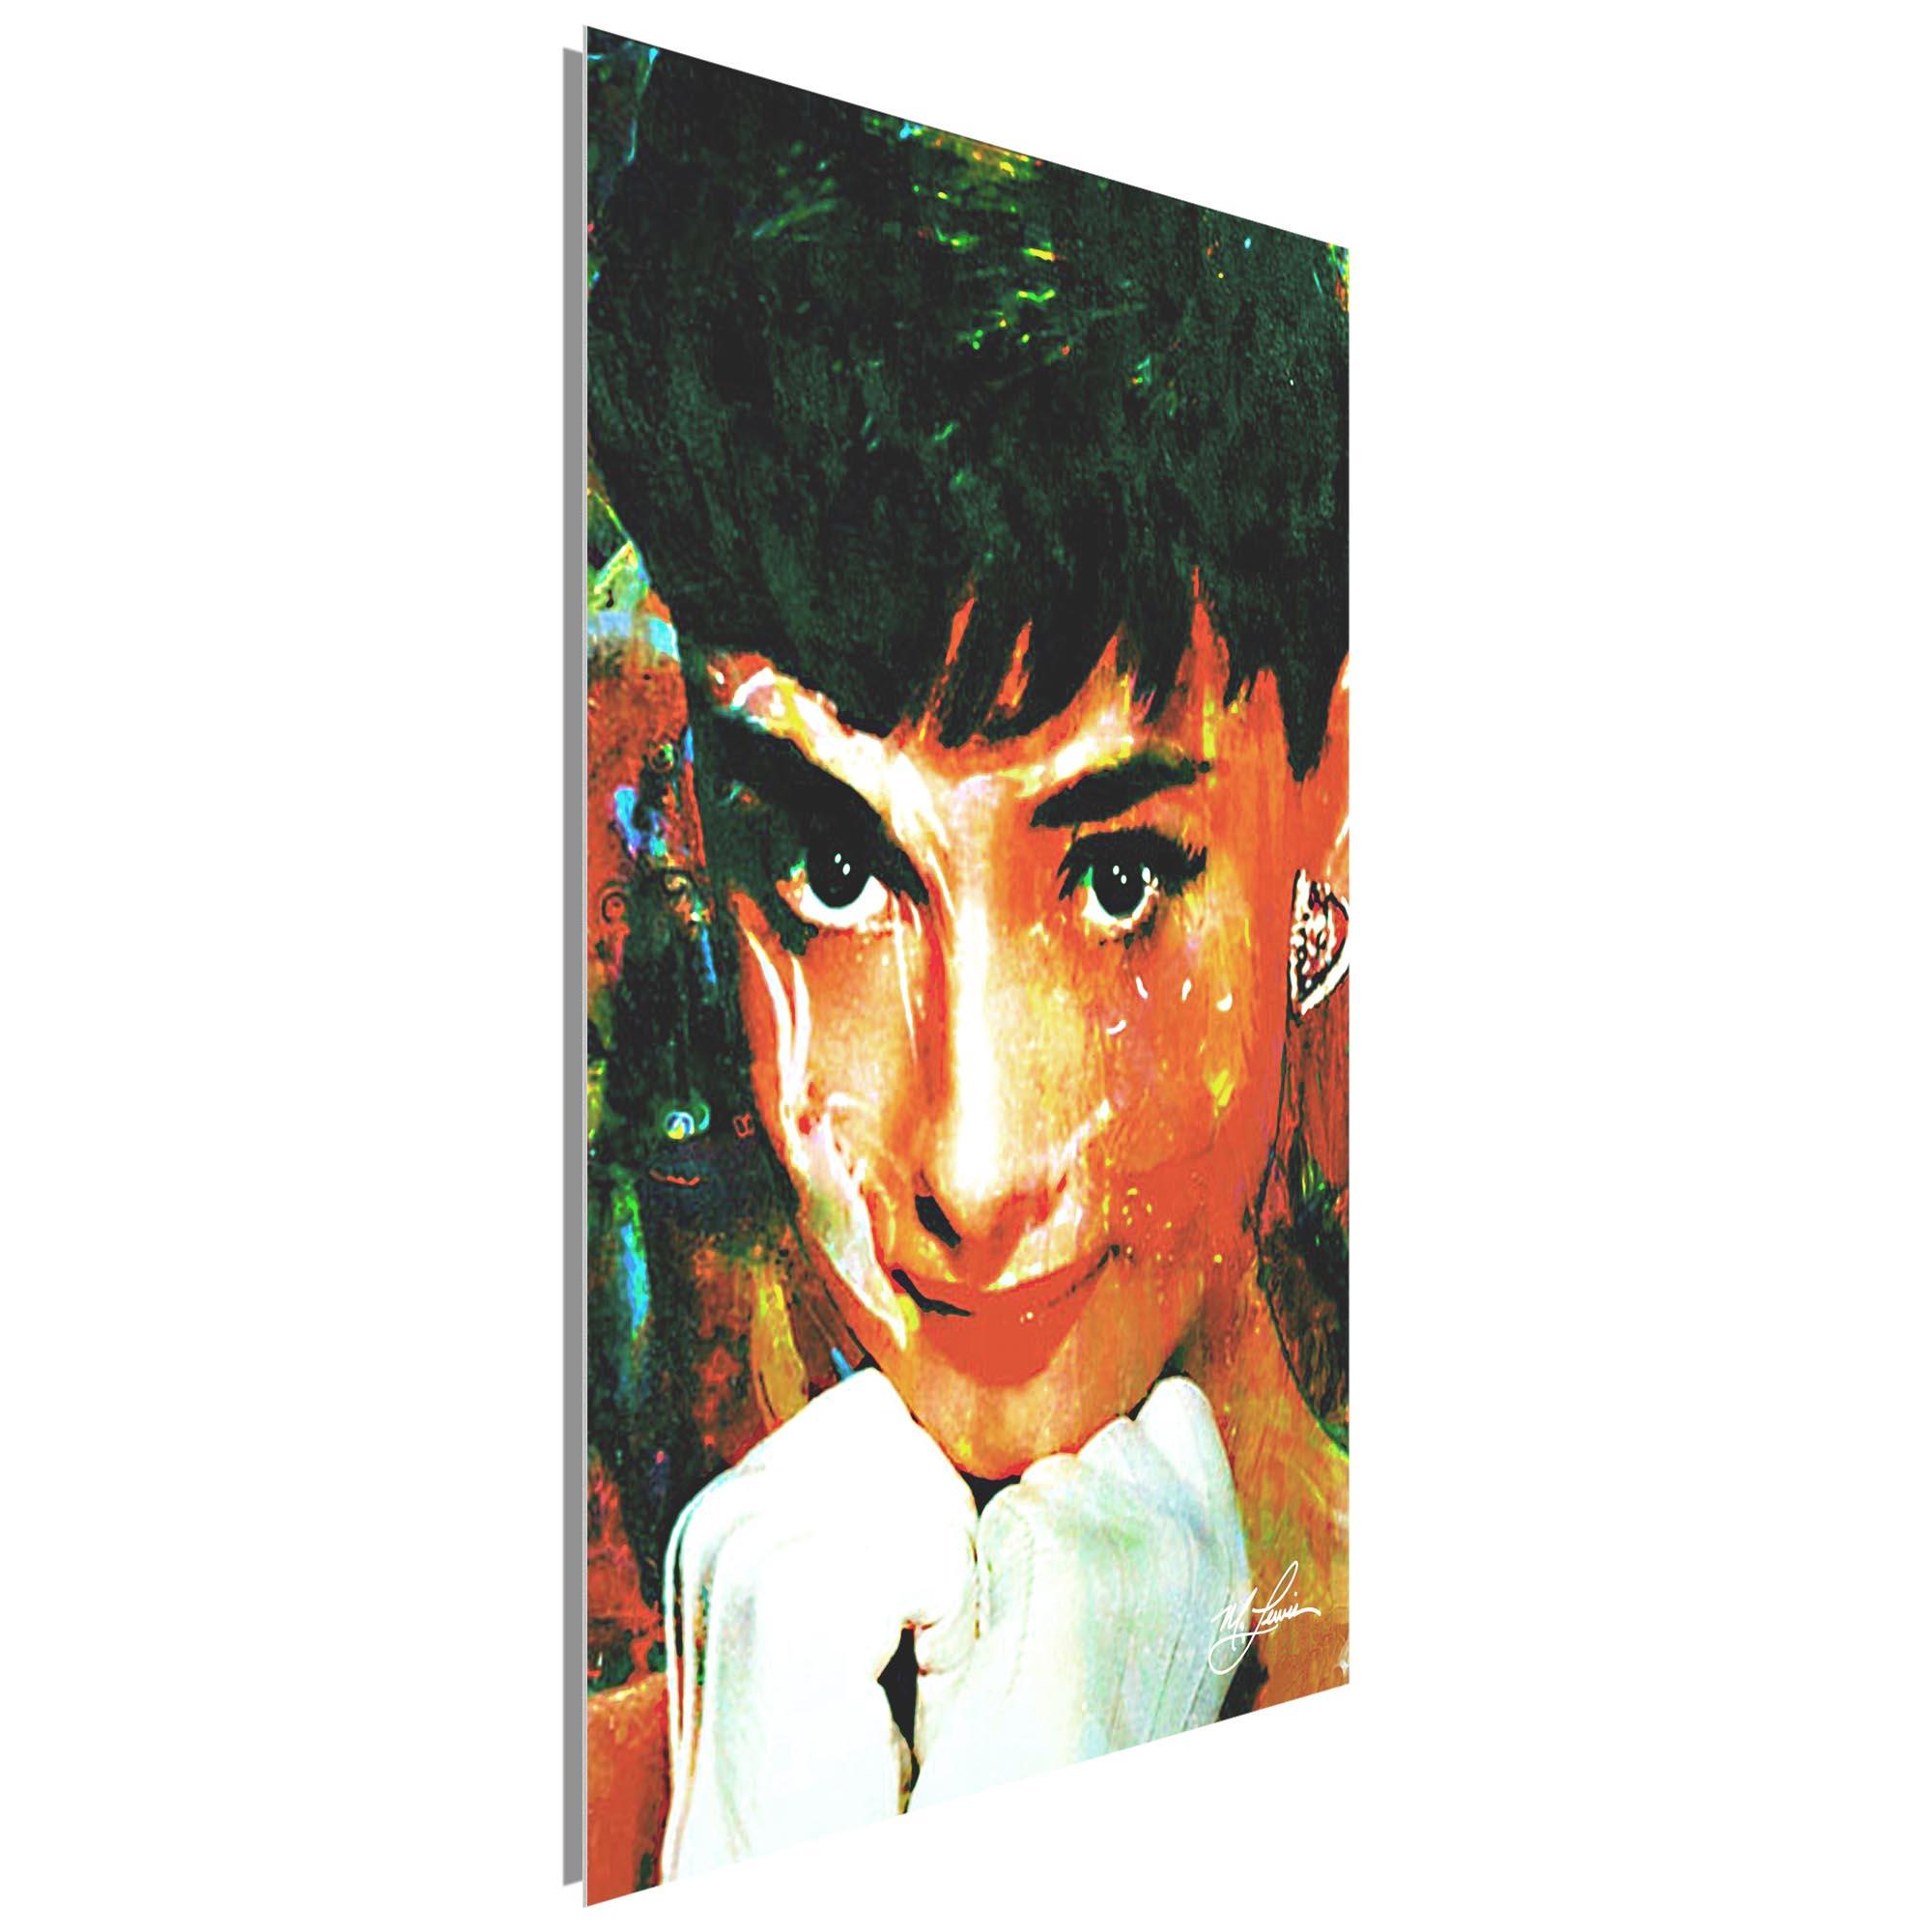 Audrey Hepburn Tiffany Delight by Mark Lewis - Celebrity Pop Art on Metal or Plexiglass - ML0003